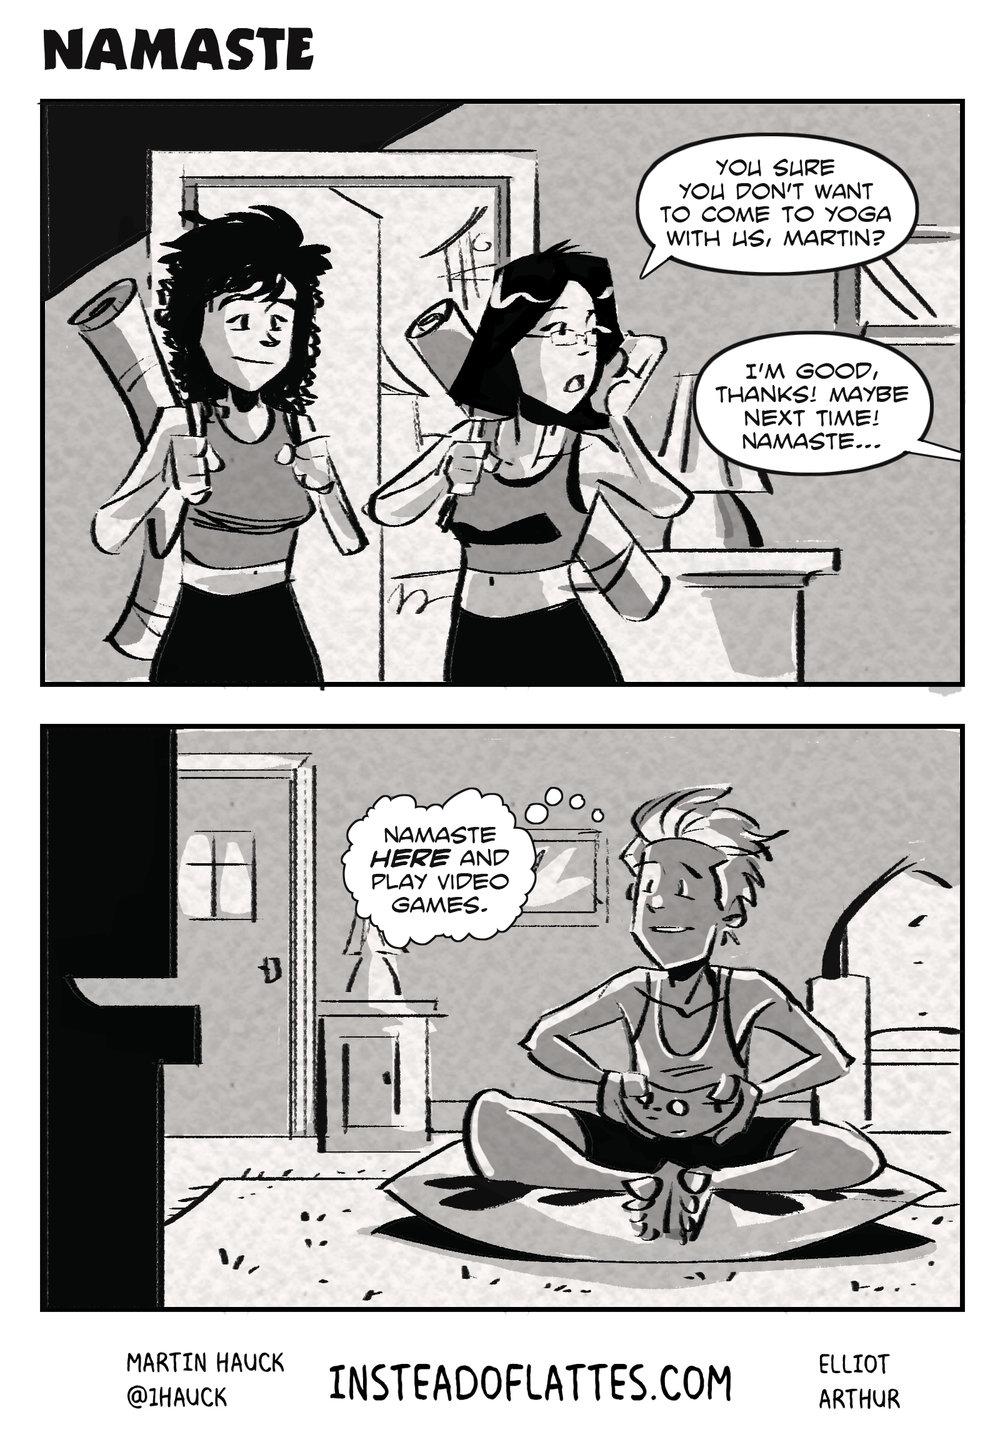 008 - Namaste.jpg